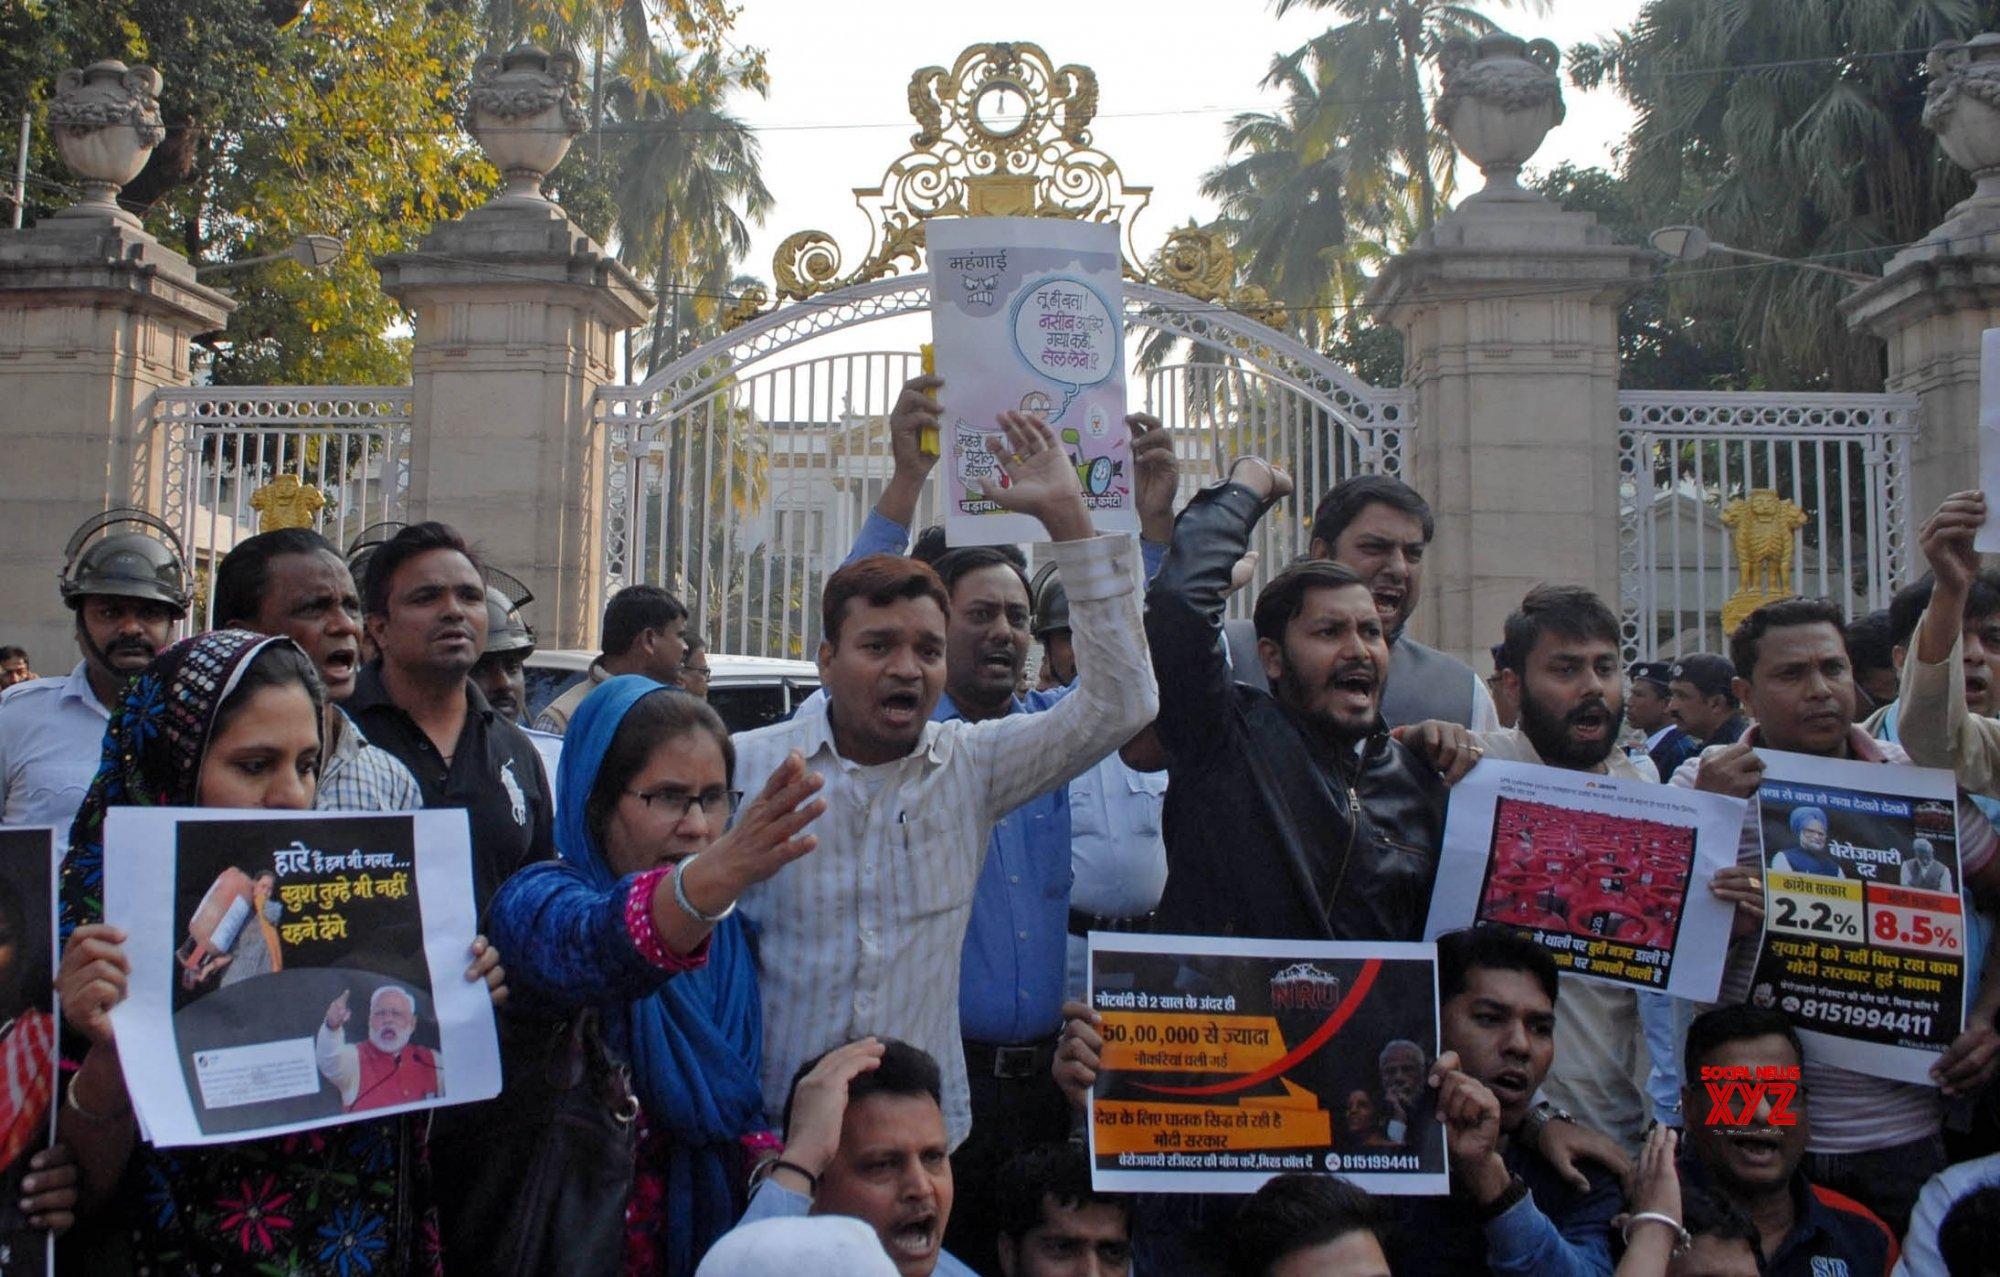 Kolkata: Congress protests against LPG price hike at Raj Bhaban #Gallery